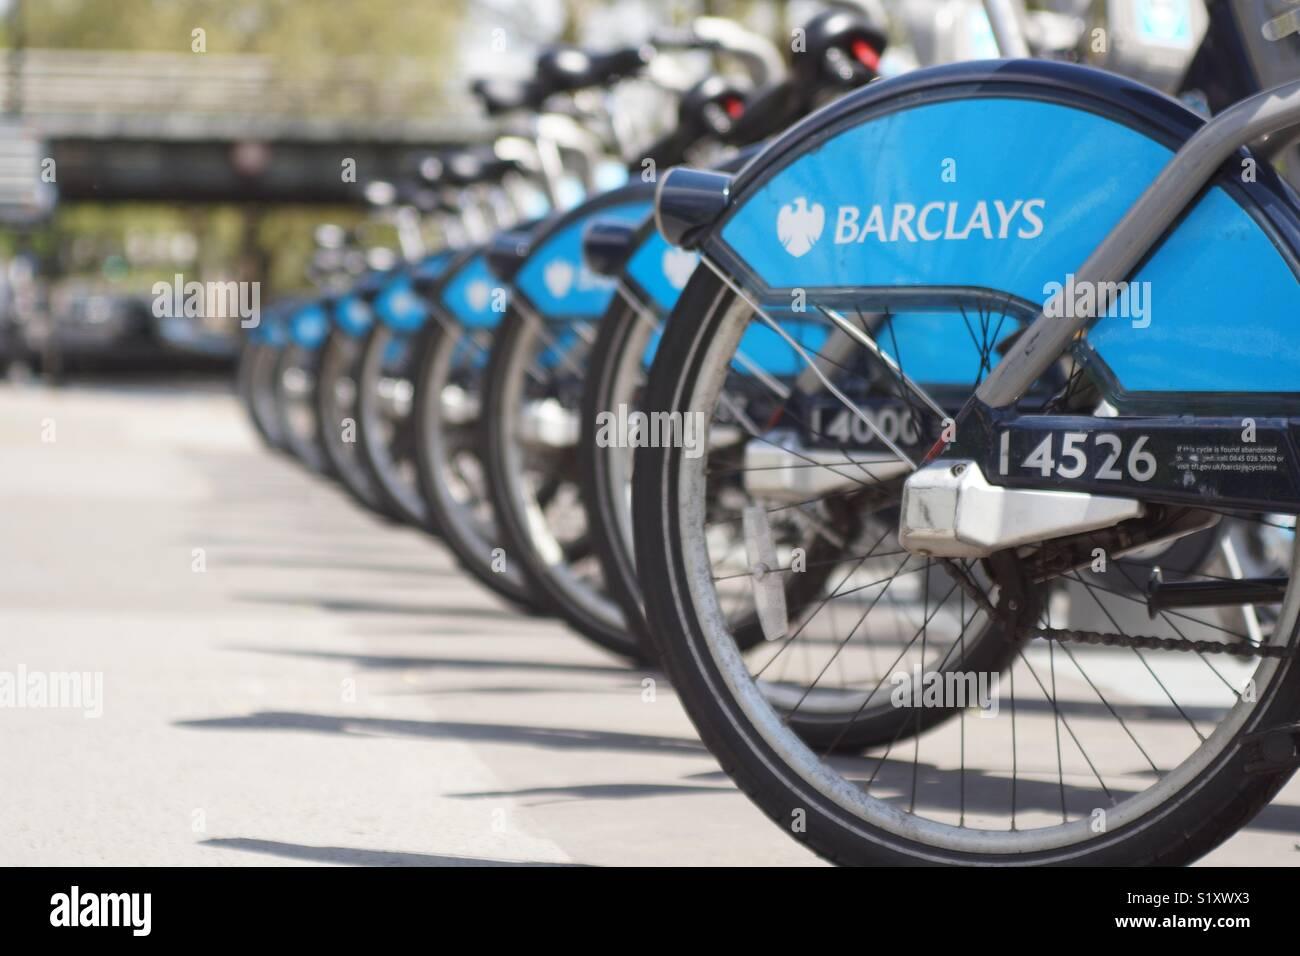 Barclays Boris Bikes, London, England, UK Stock Photo